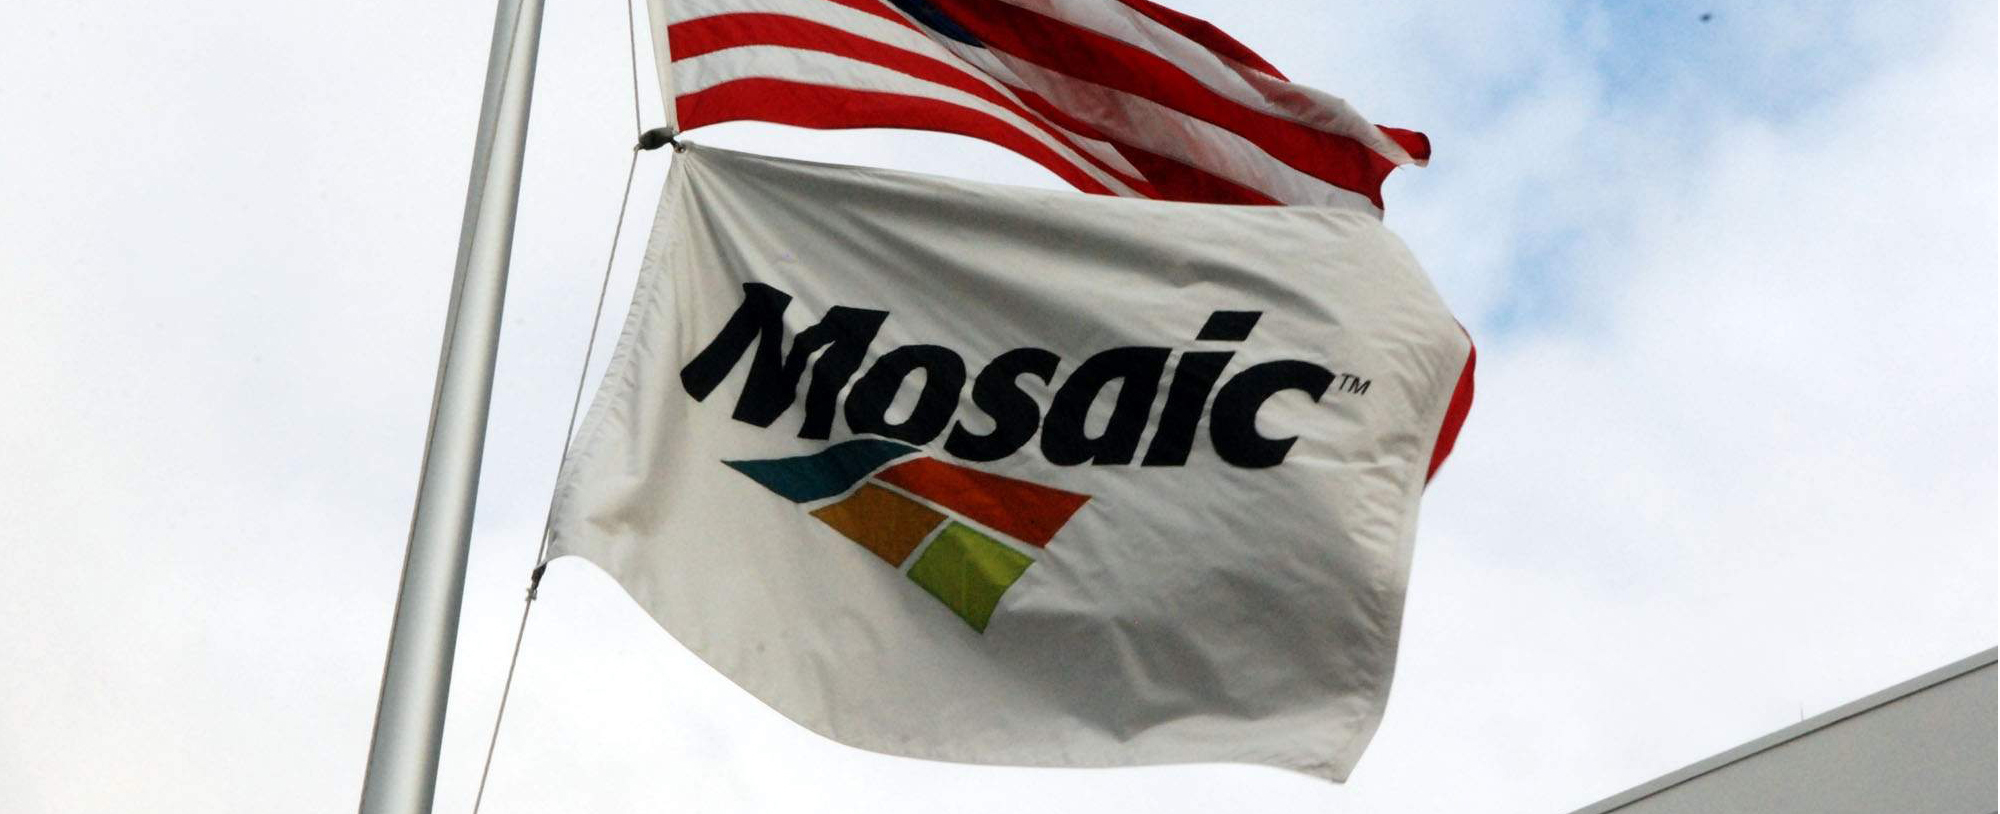 mosaic-flag-copy.jpg